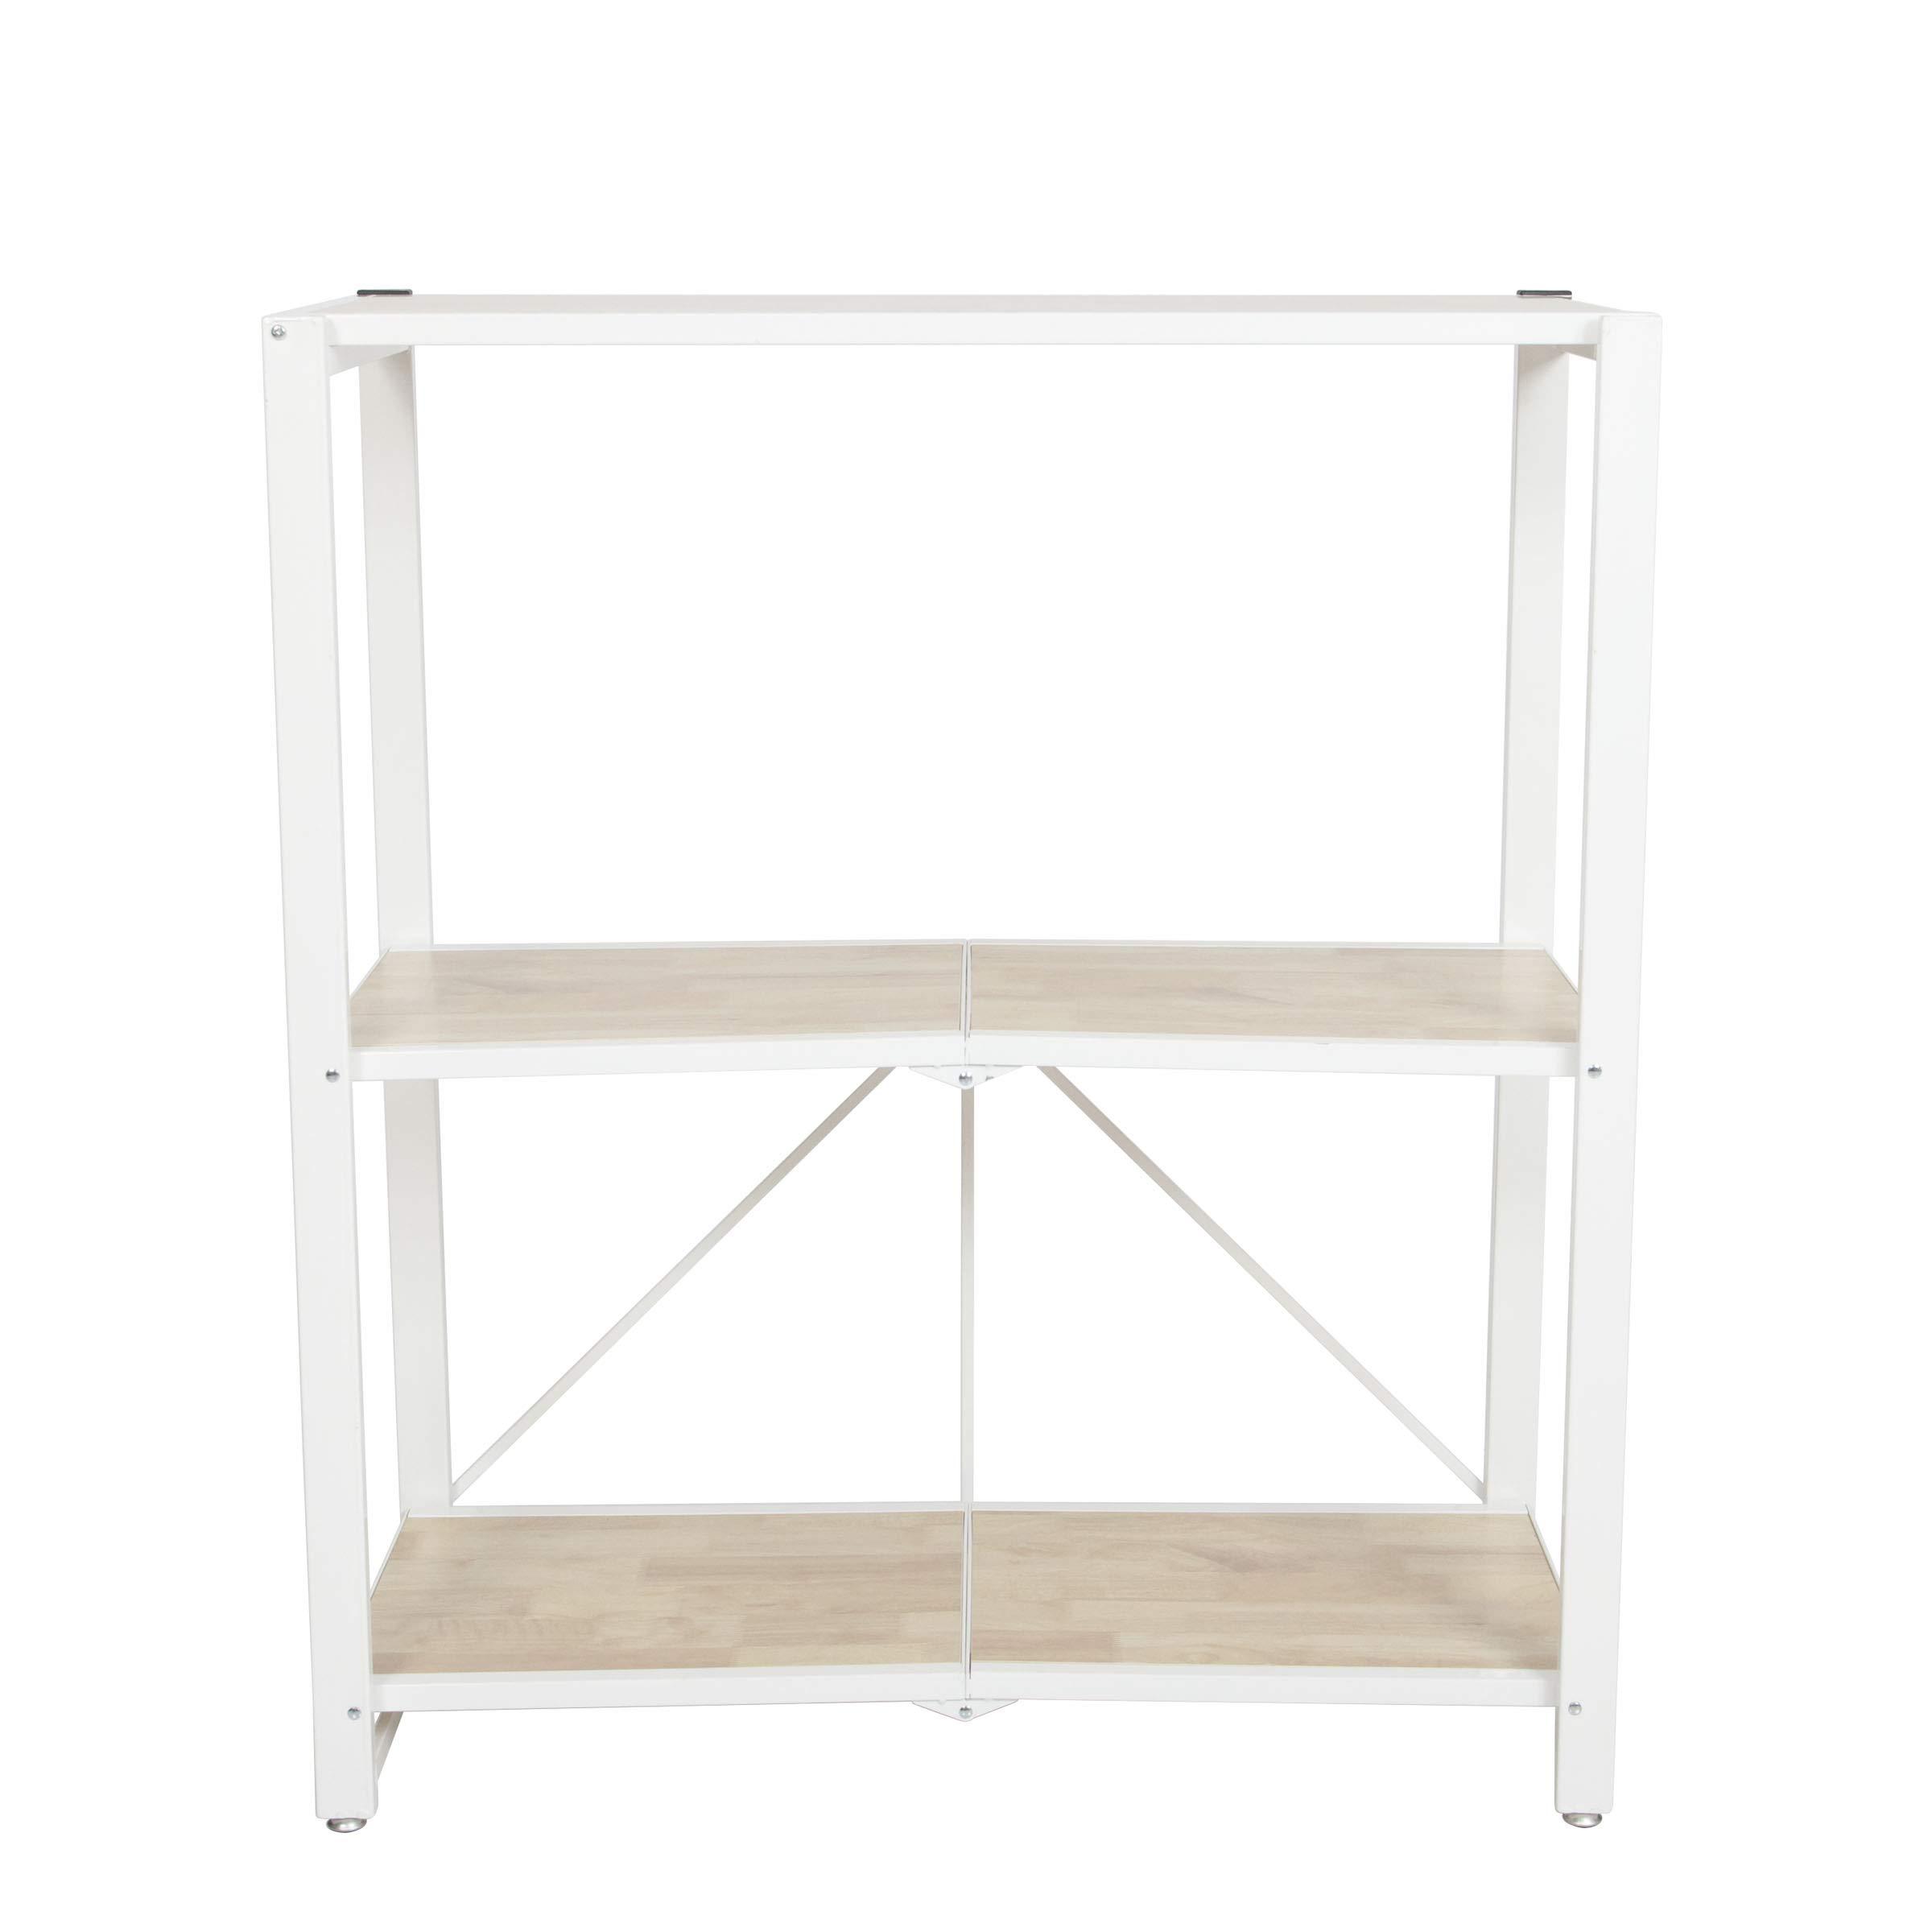 Origami Folding 4-Tier Heavy Duty Steel Baker's Rack with Wood Shelf, White by Origami (Image #6)